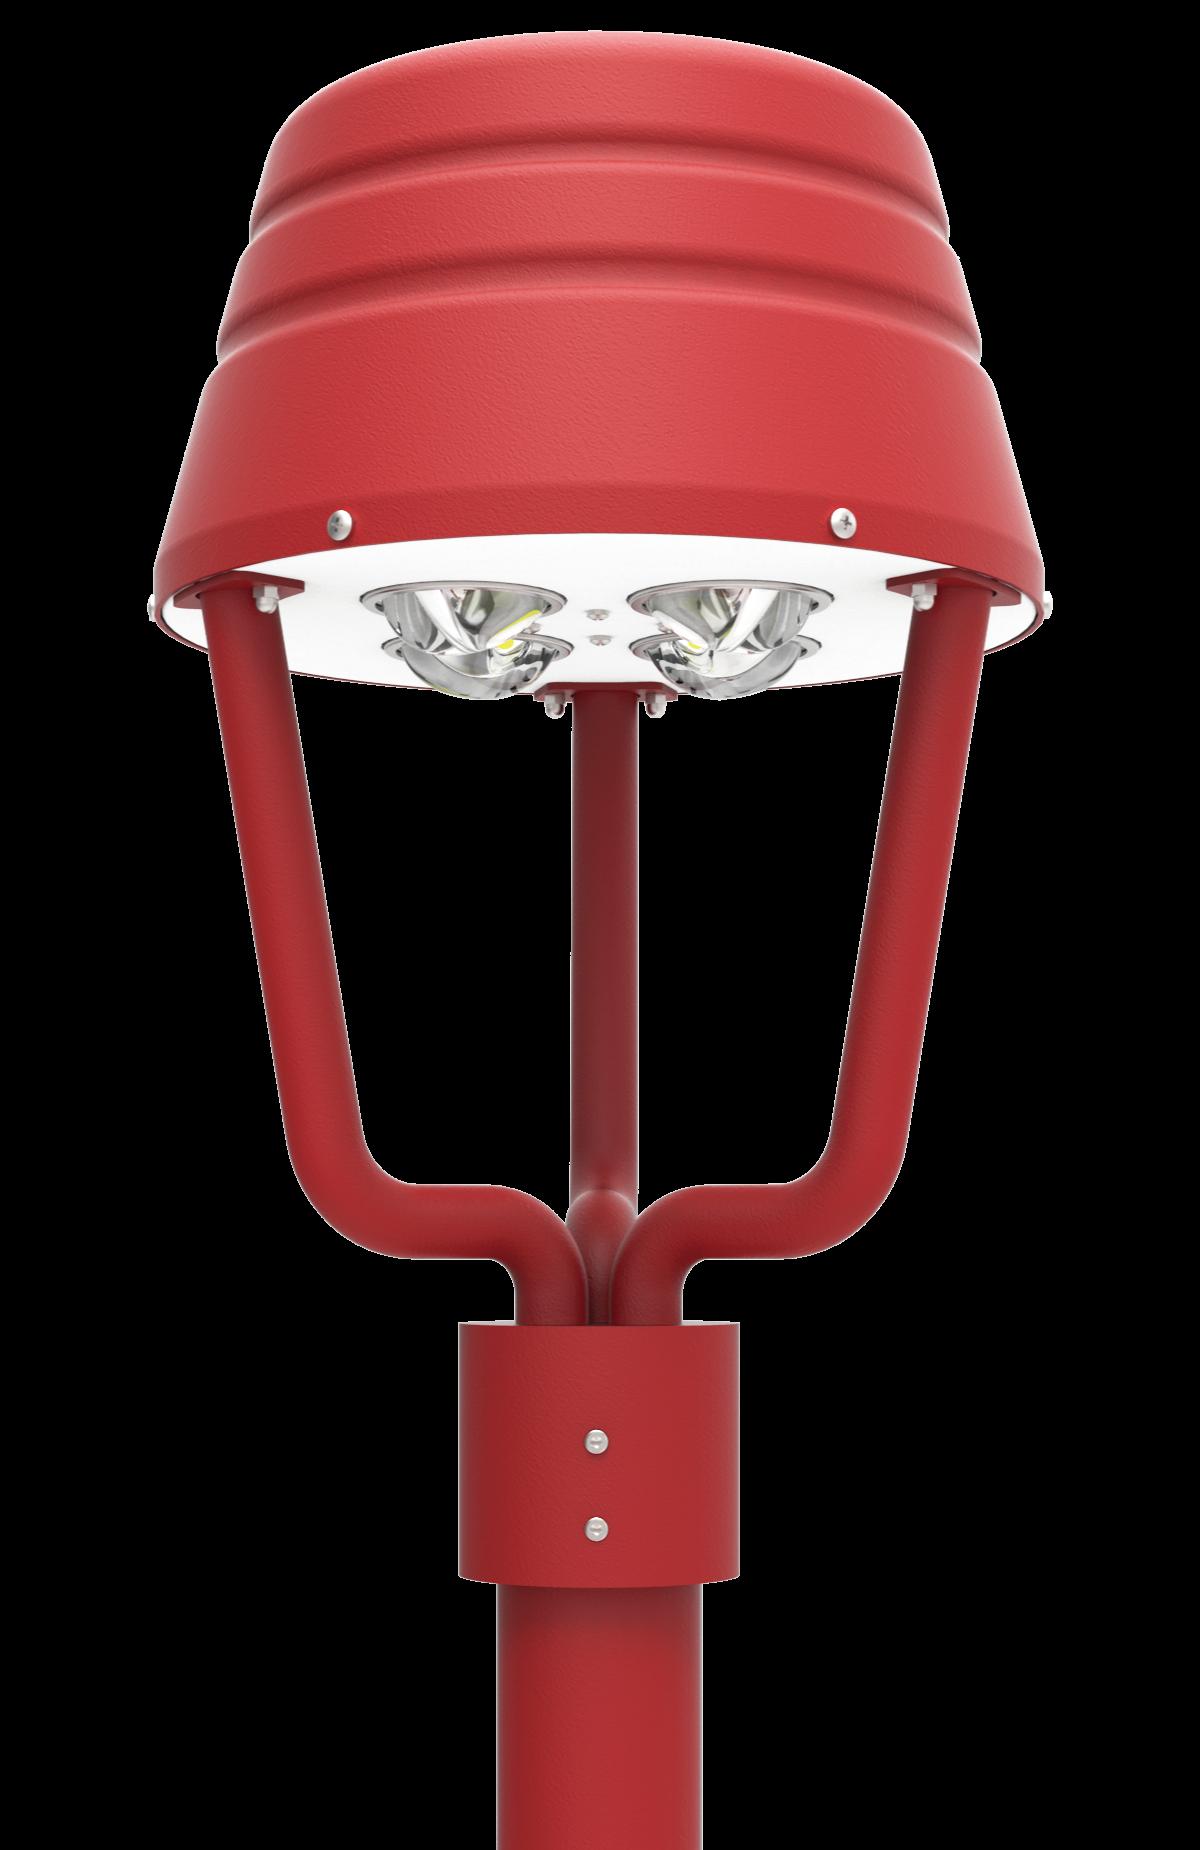 Led Pt 120 Series Led Post Top Light Fixtures Outdoor Luminaires Light Fixtures Led Lighting Solutions Light